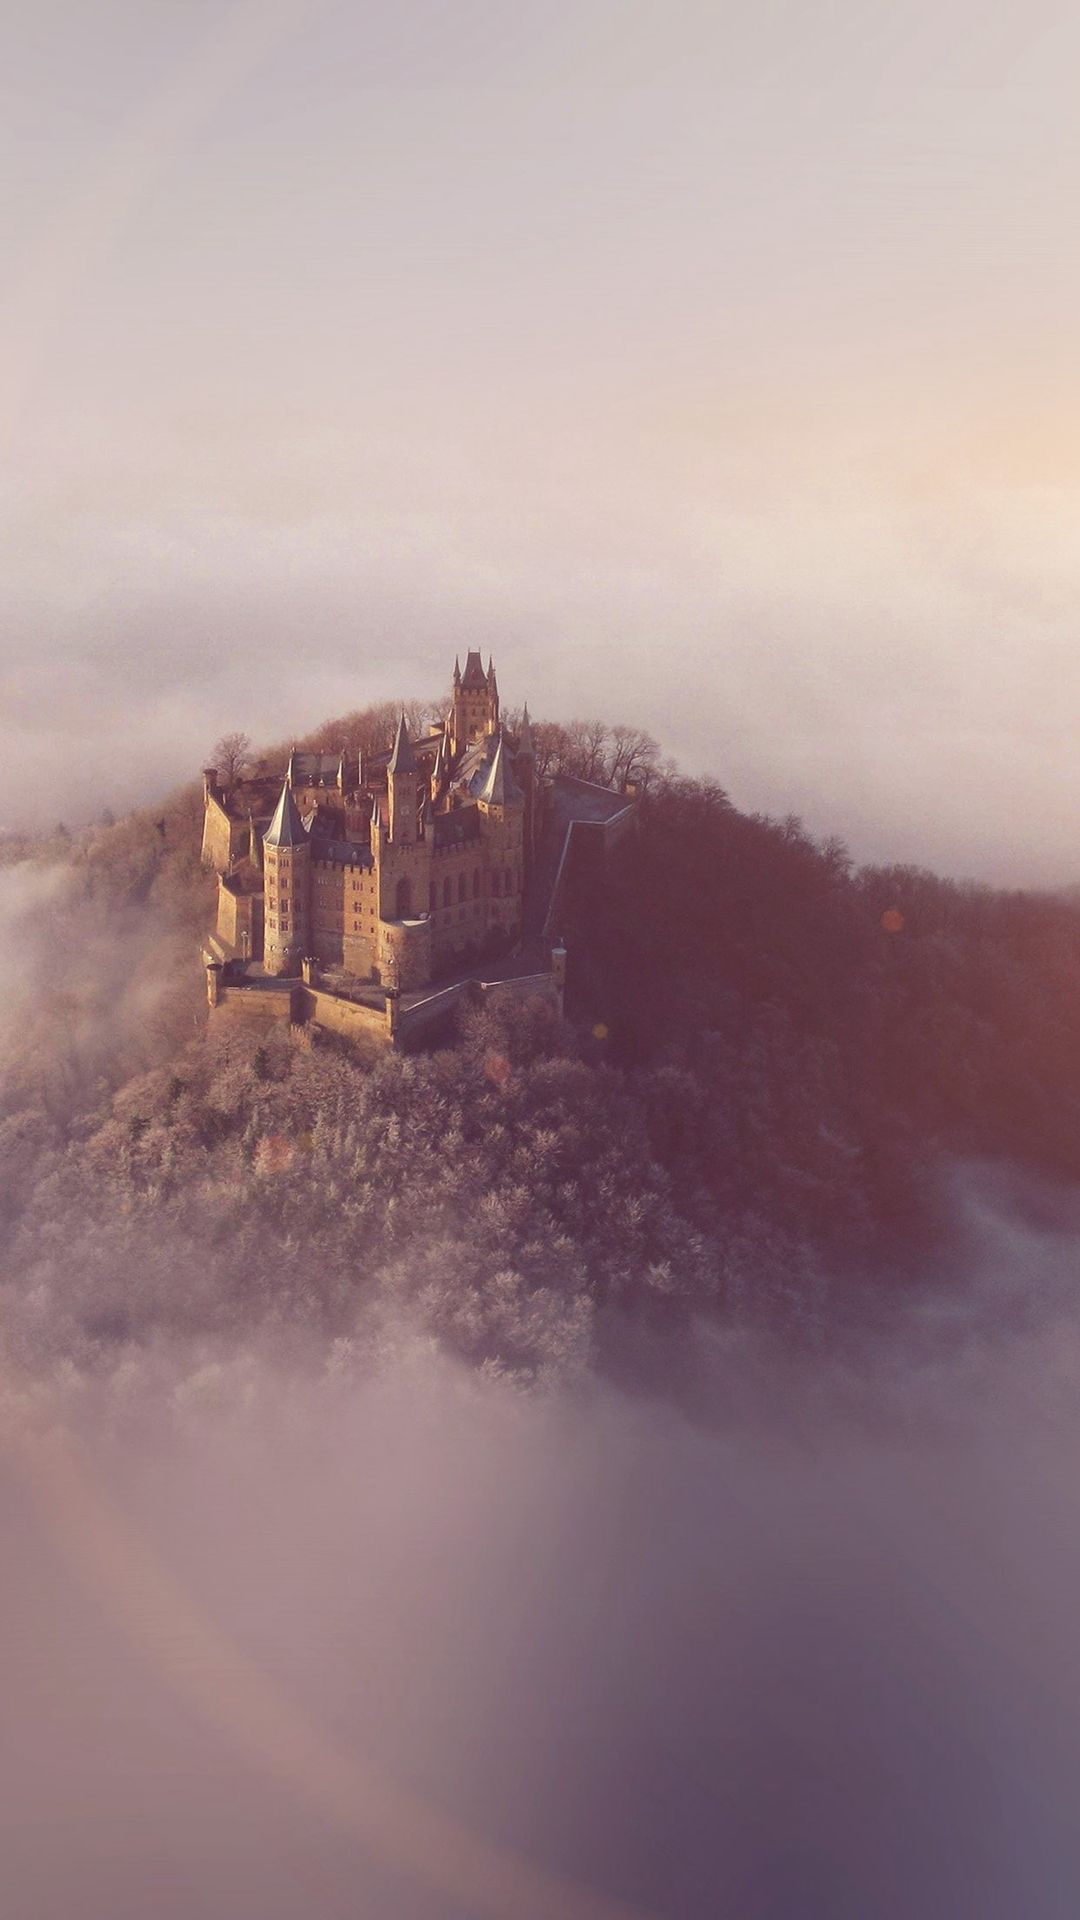 Castle Sky Cloud Dream Fantasy Art Nature Flare Iphone 6 Plus Wallpaper Harry Potter Wallpaper Backgrounds Fantasy Pictures Beast Wallpaper